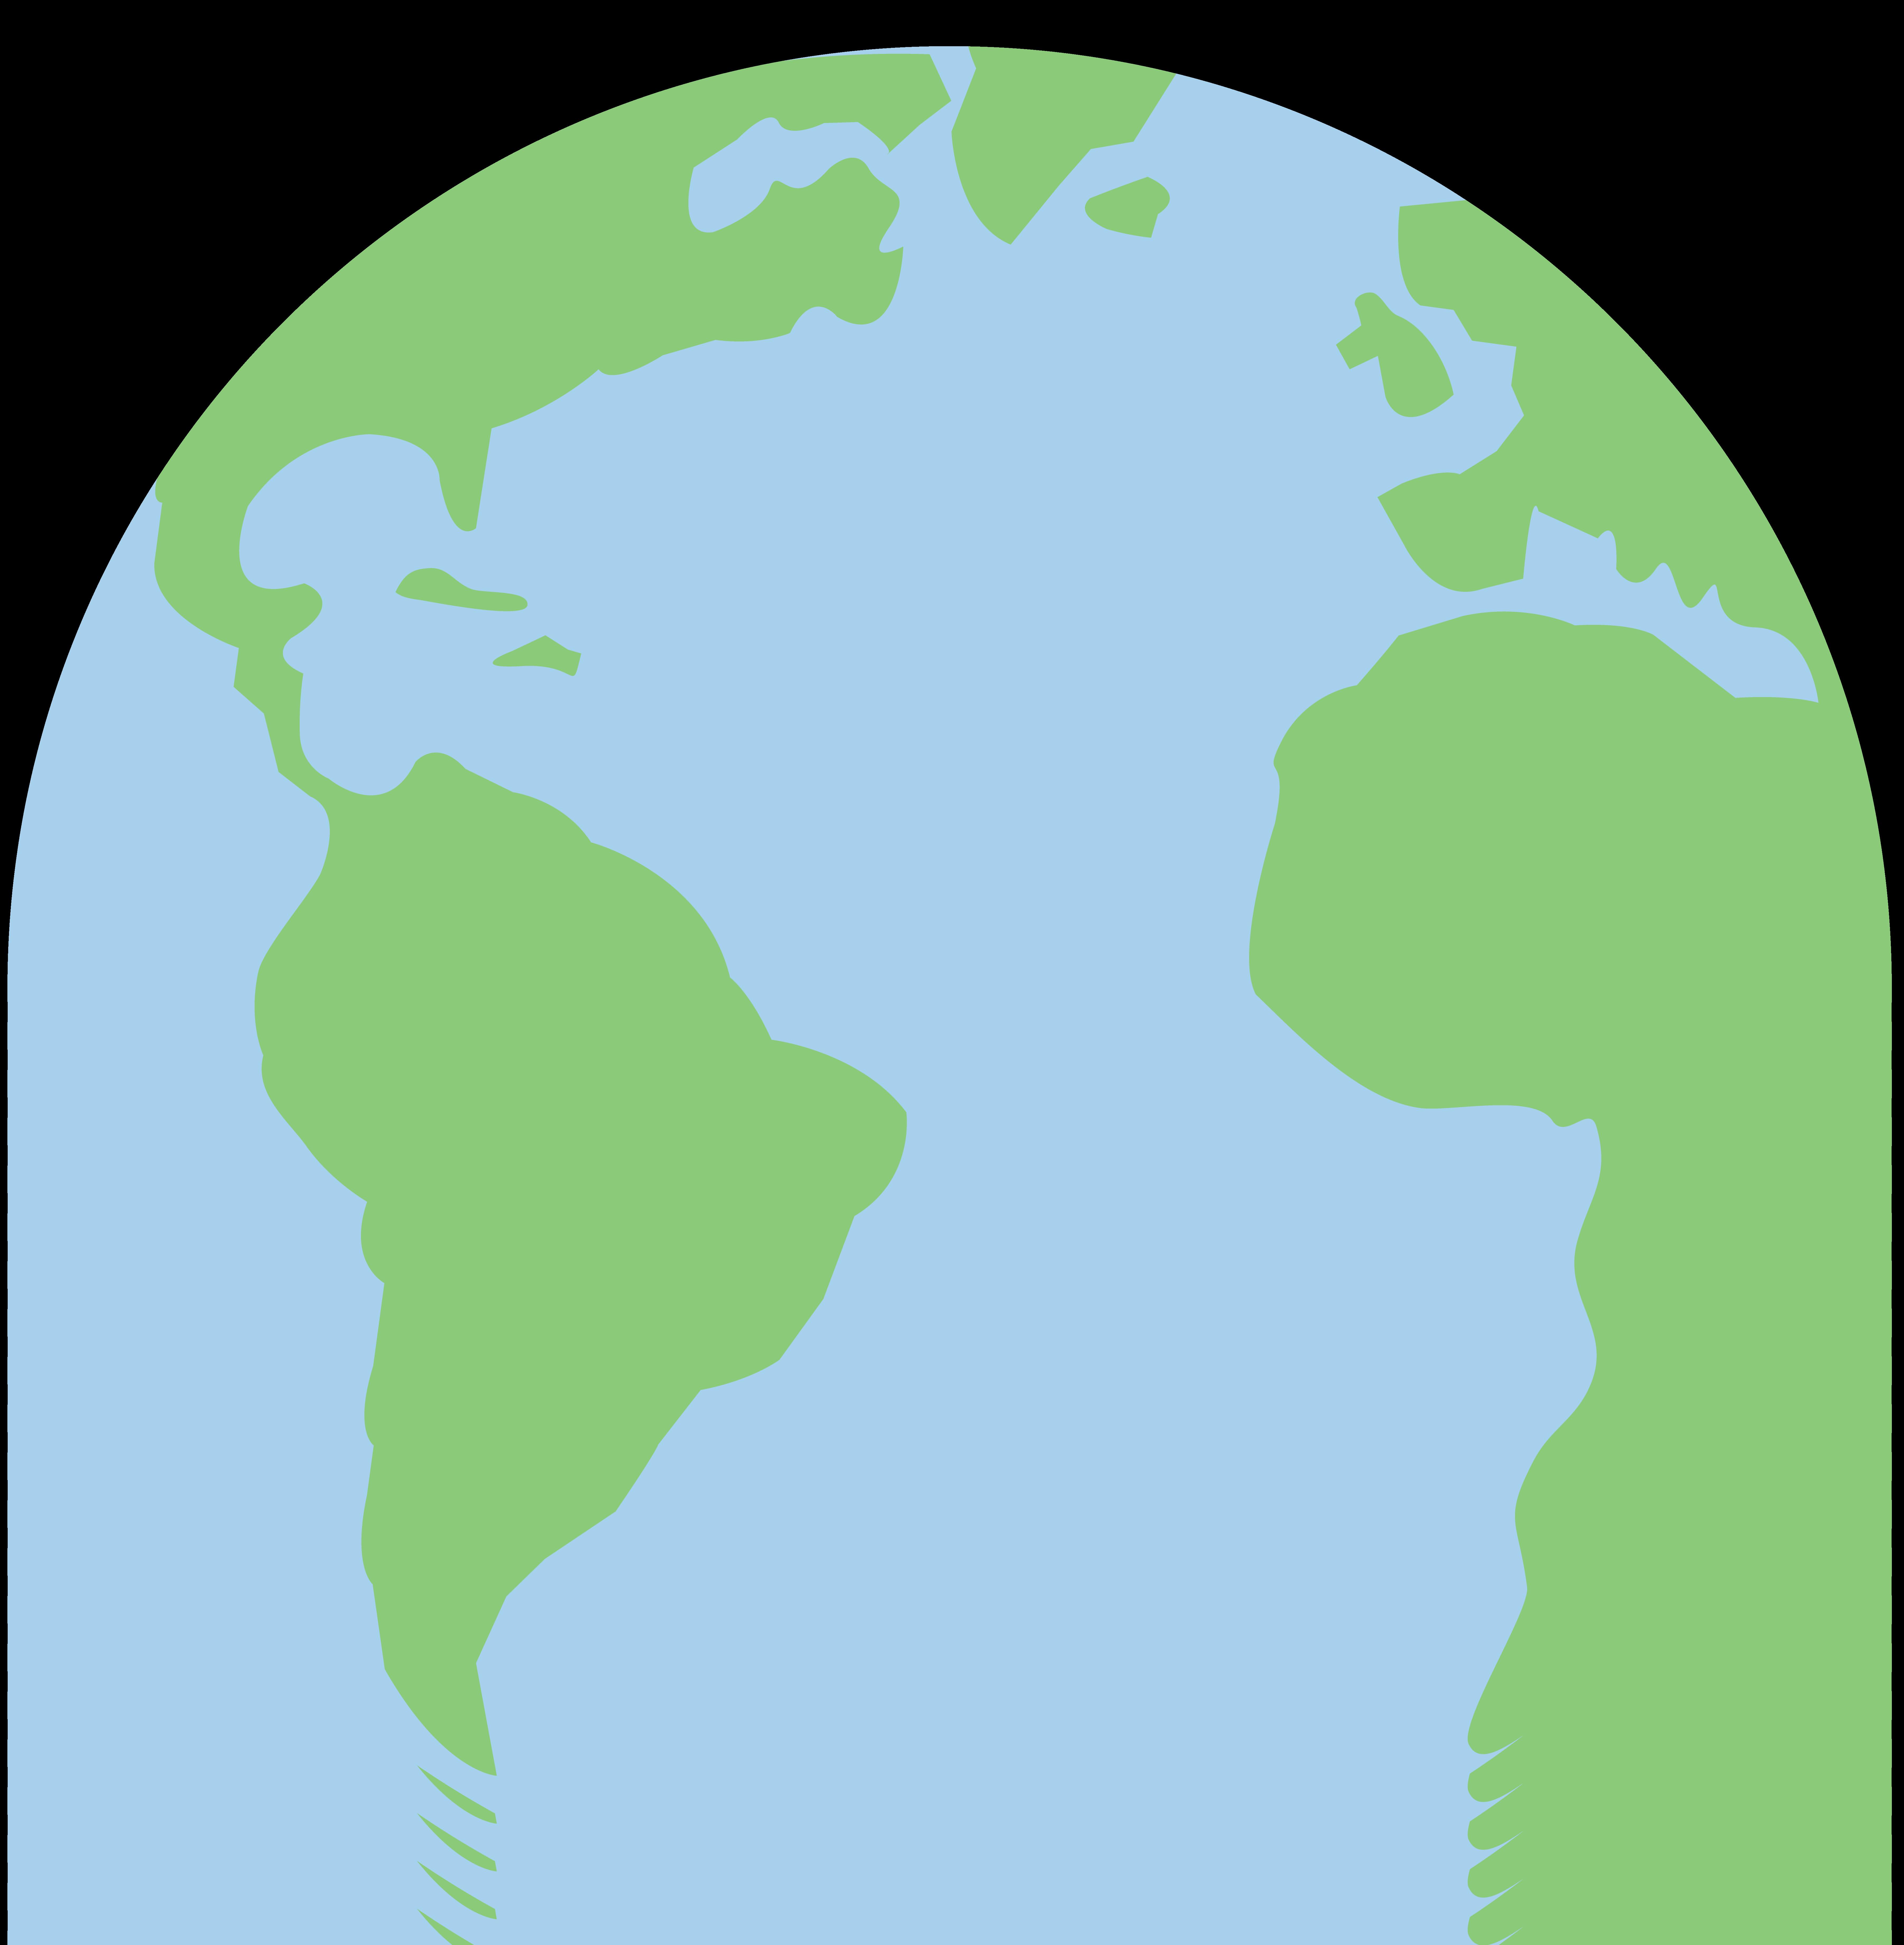 Free cartoon earth pics. Mars clipart planet outline